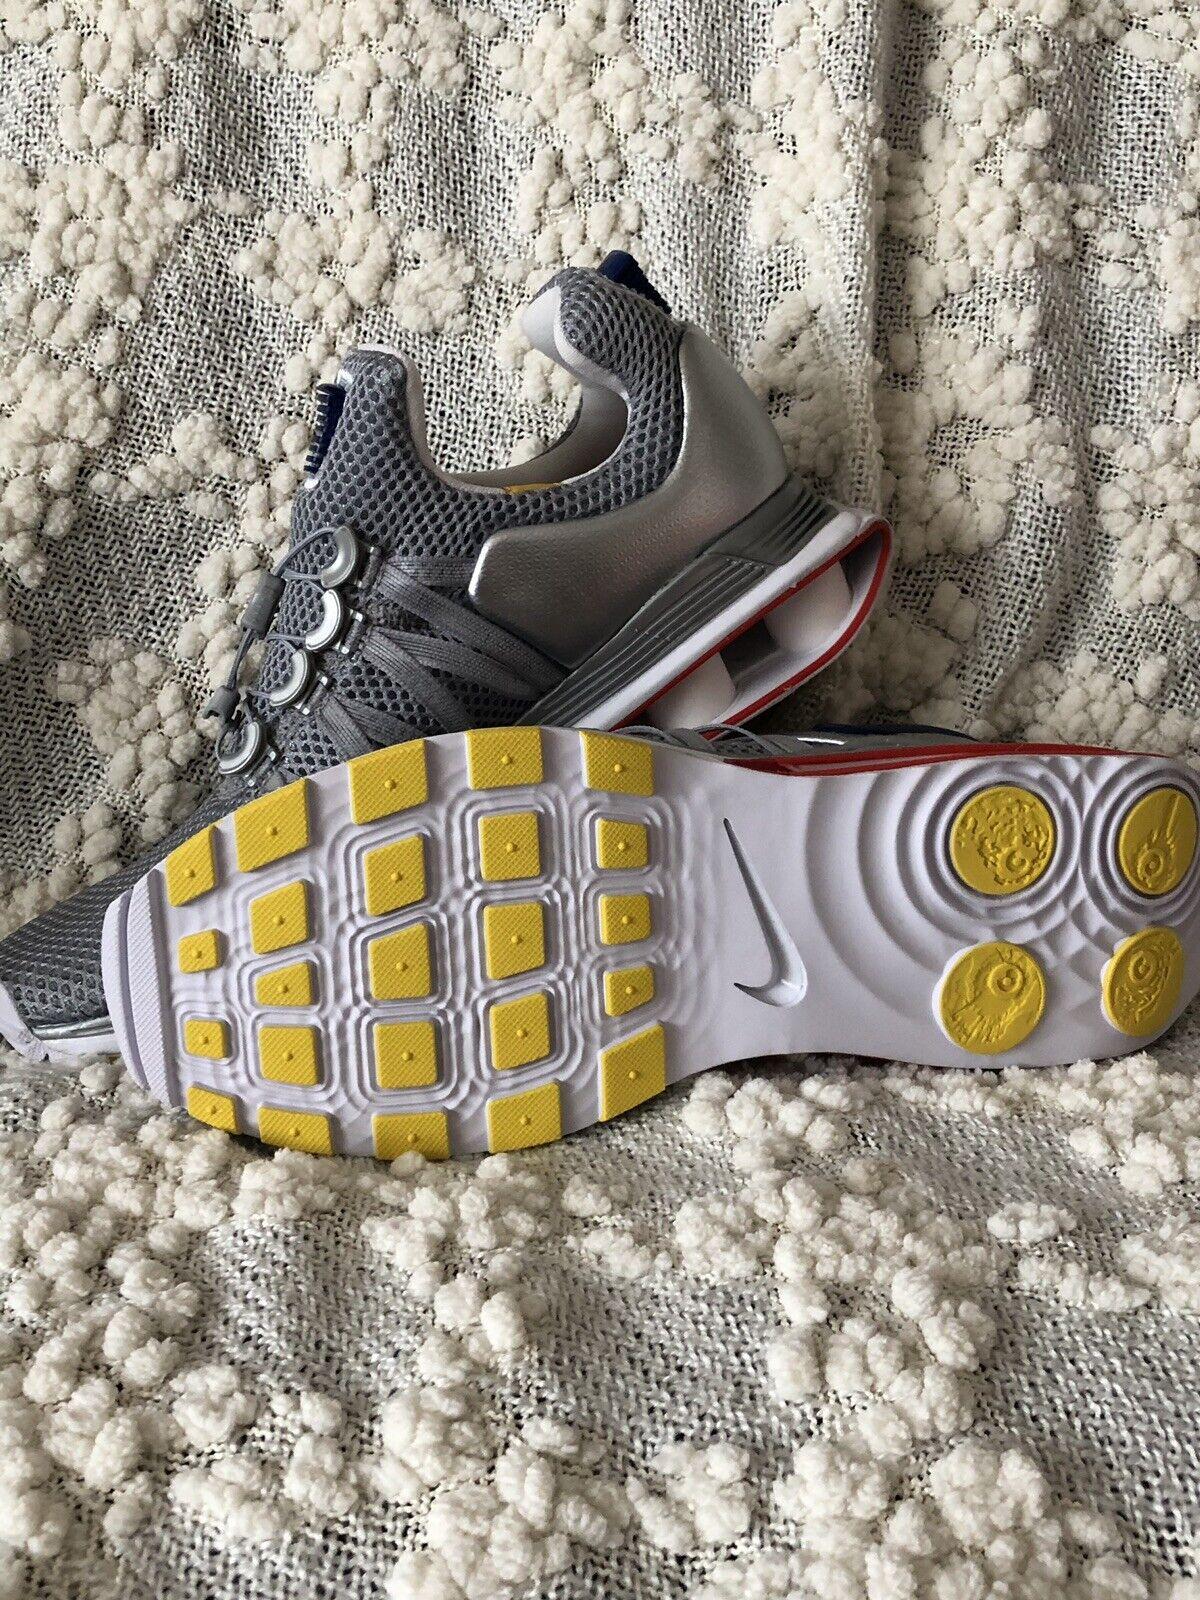 New Mens Nike Shox Gravity Metallic Silver Gym bluee White Running shoes Size 9